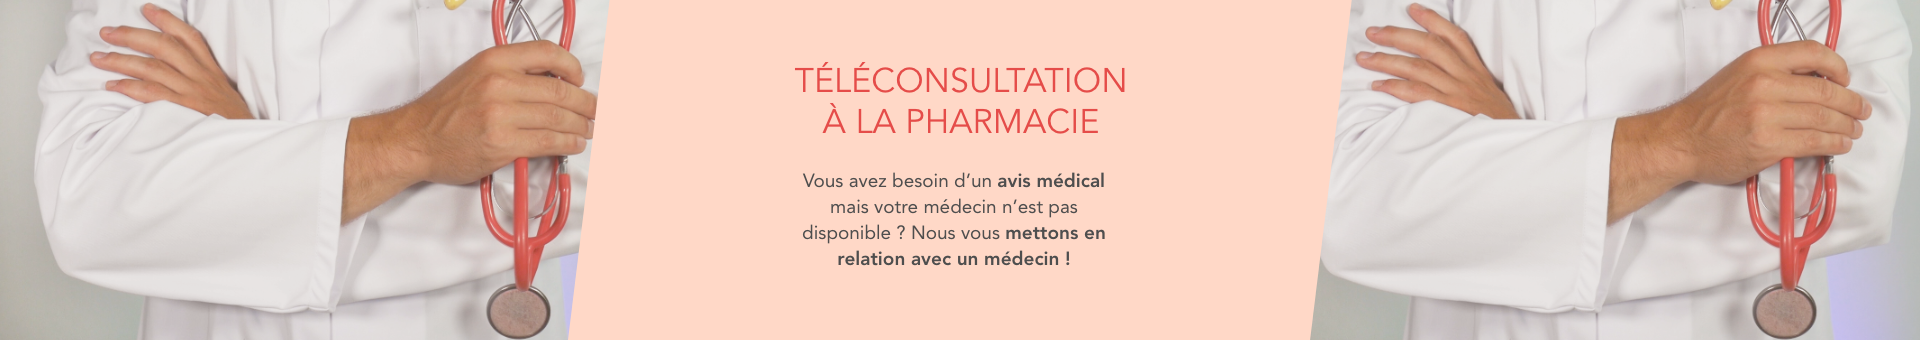 Pharmacie des Arènes,SAINTES